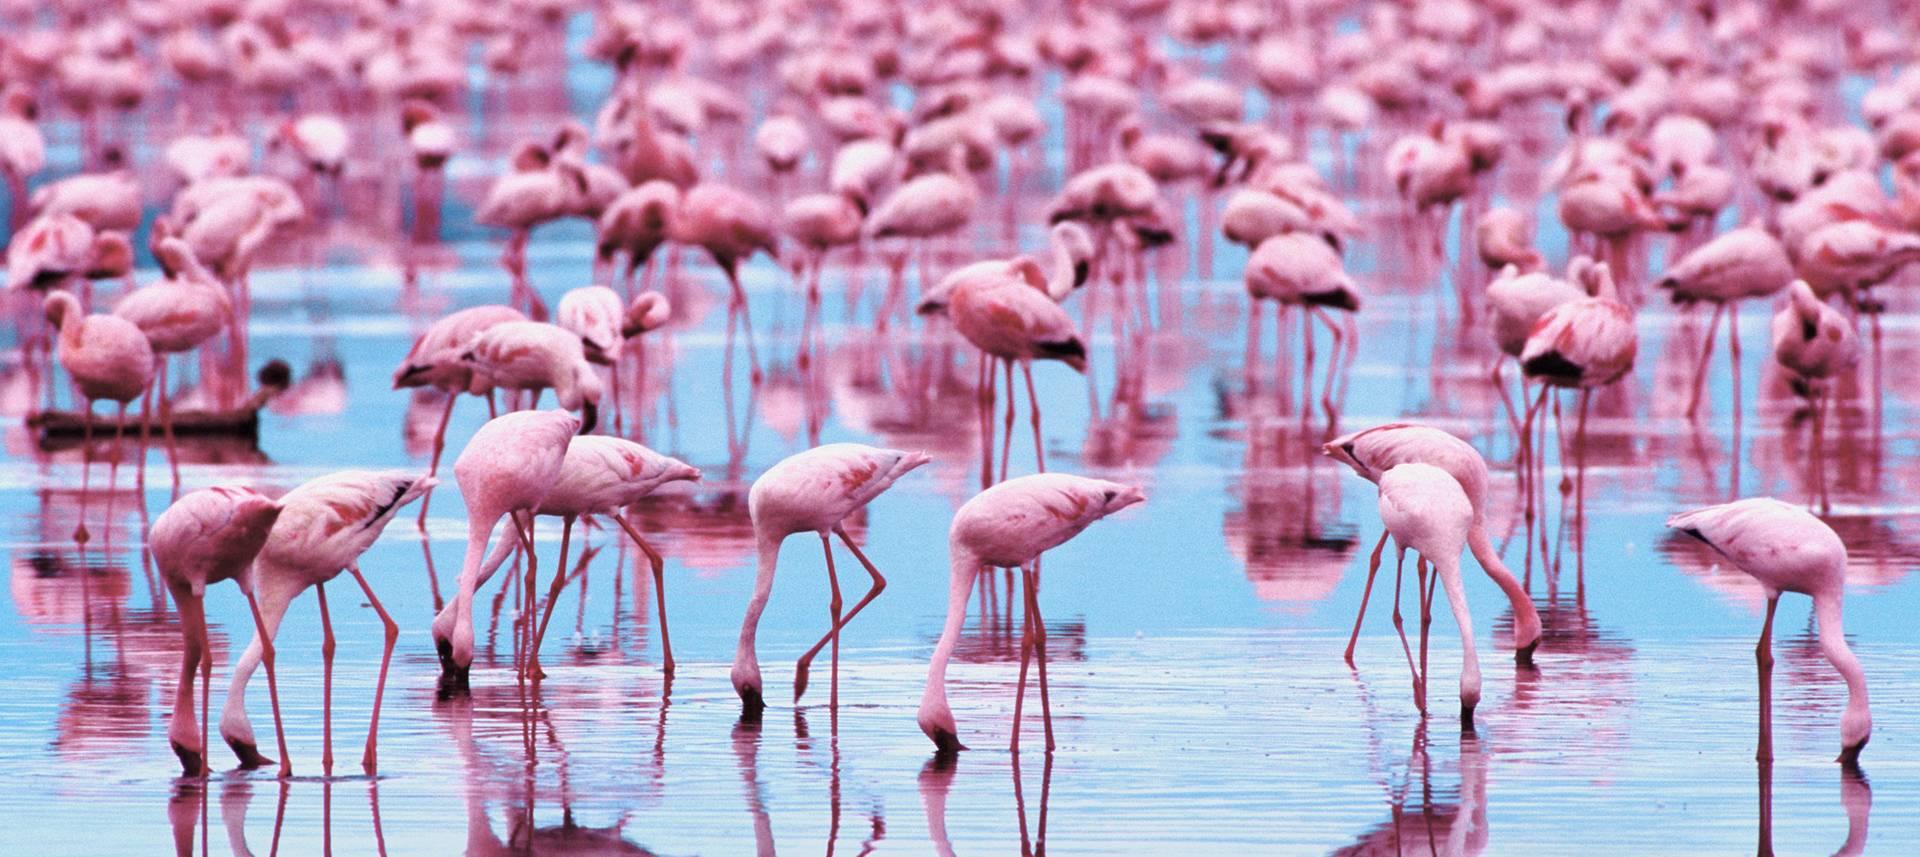 Pink Flamingo Wallpapers Download at